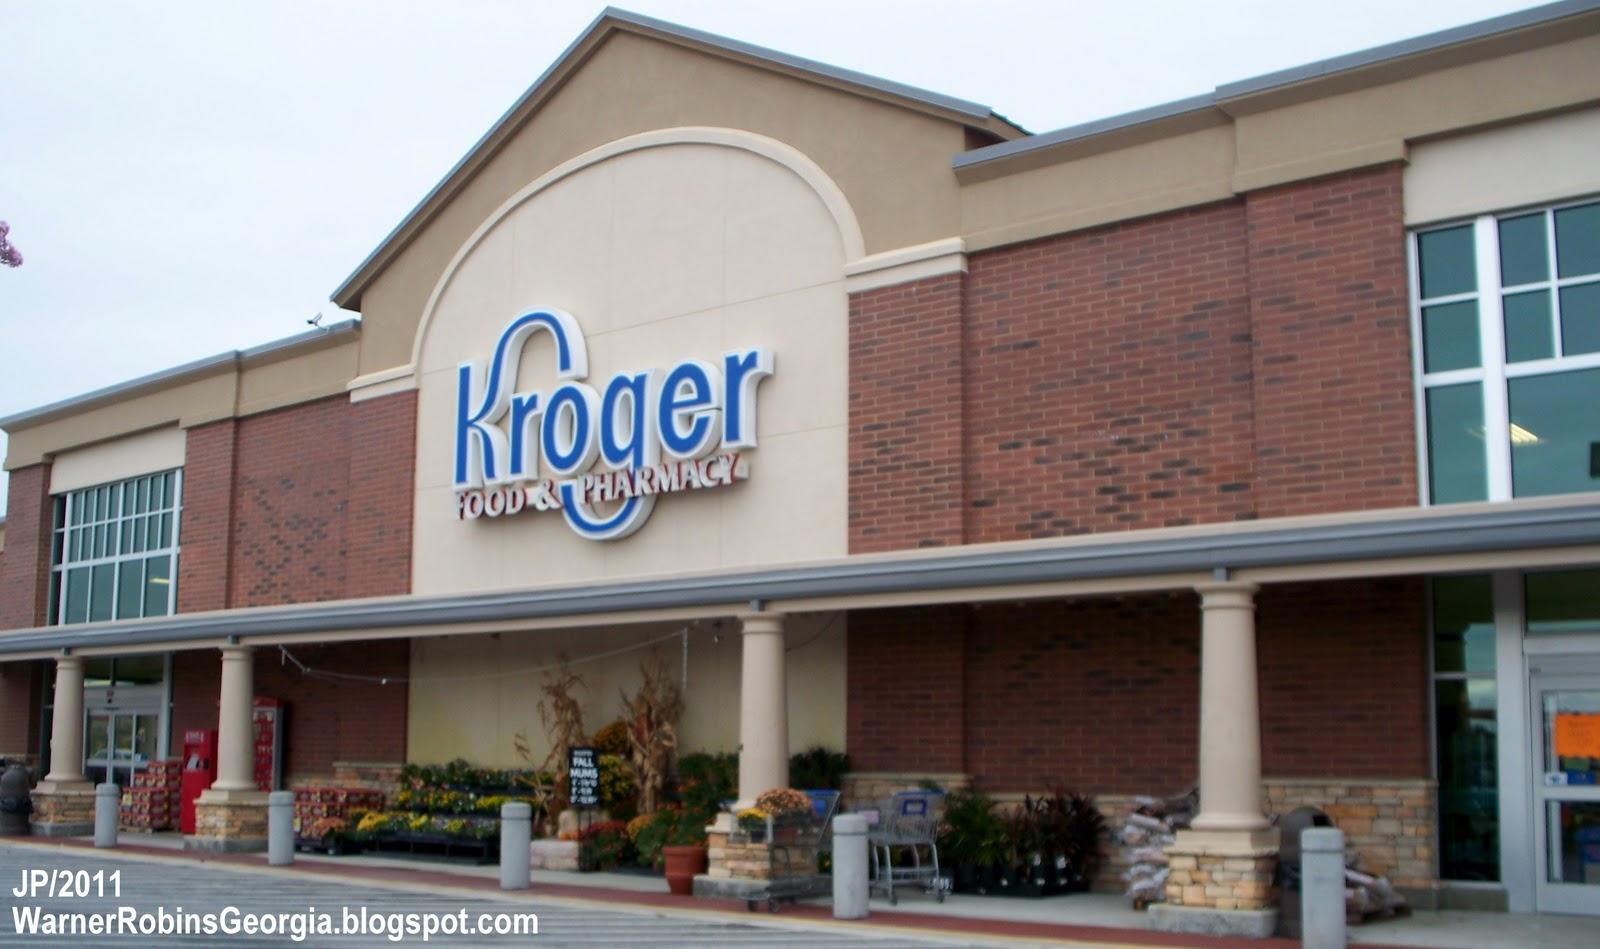 Warner Robins Georgia Air Force Base Houston Restaurant Bank Attorney Hospital Dept Store Hotel